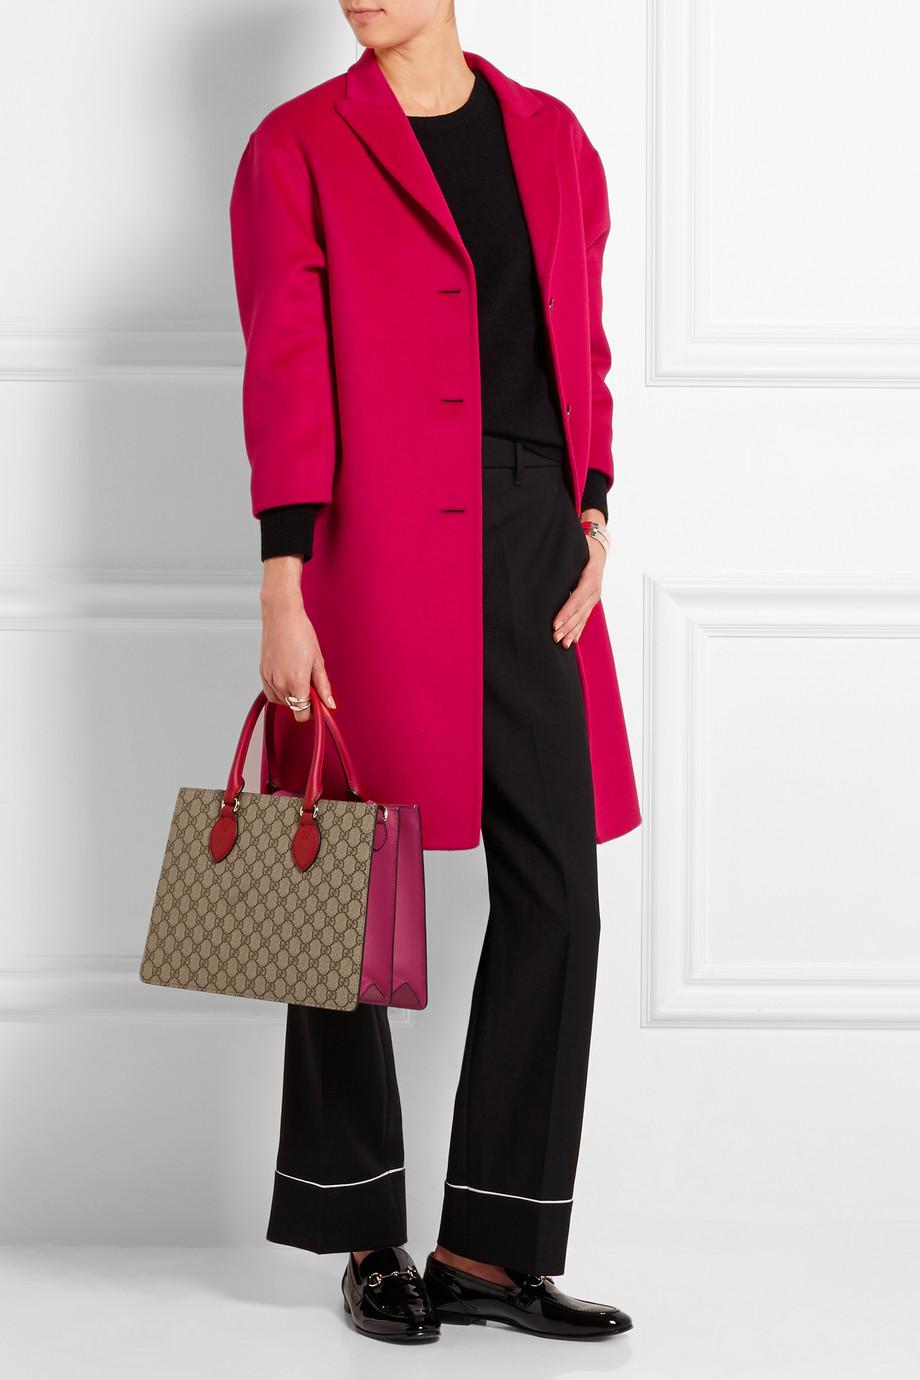 Gucci Oversized Wool and Angora-Blend Coat - £1,900